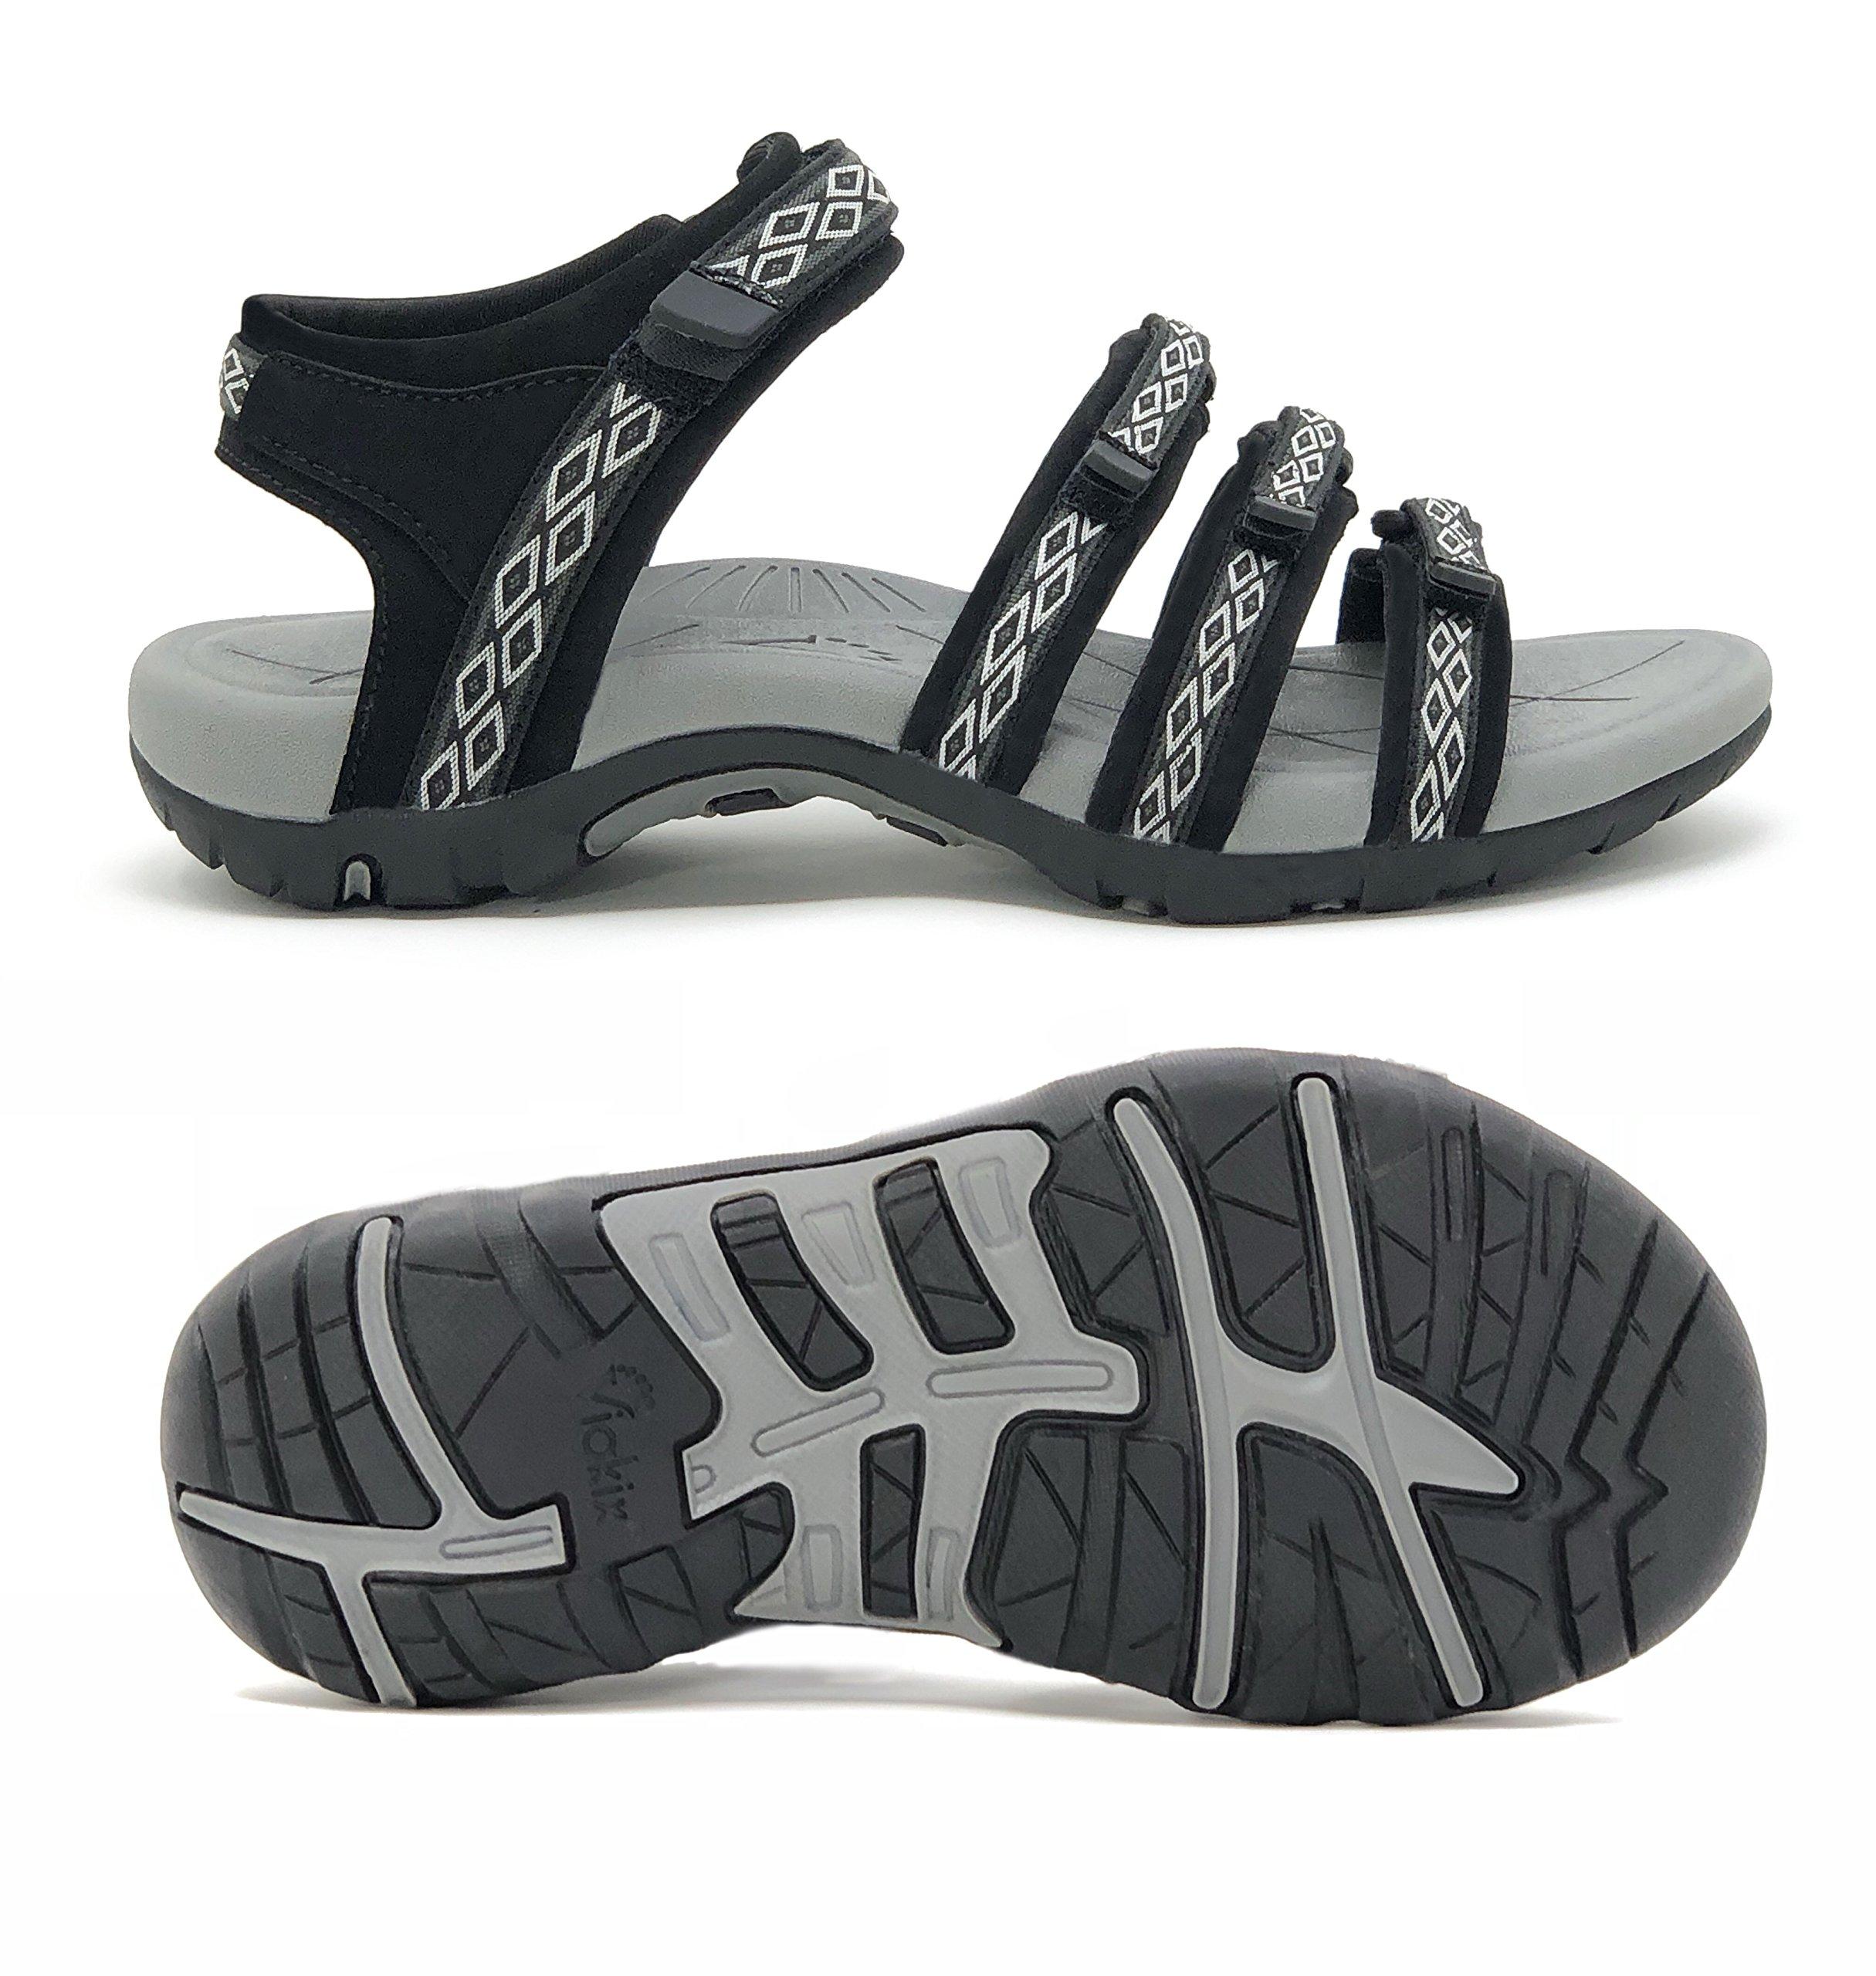 Viakix Hiking Sandals Women- Athletic Sport Sandal for Outdoors Walking Water by Viakix